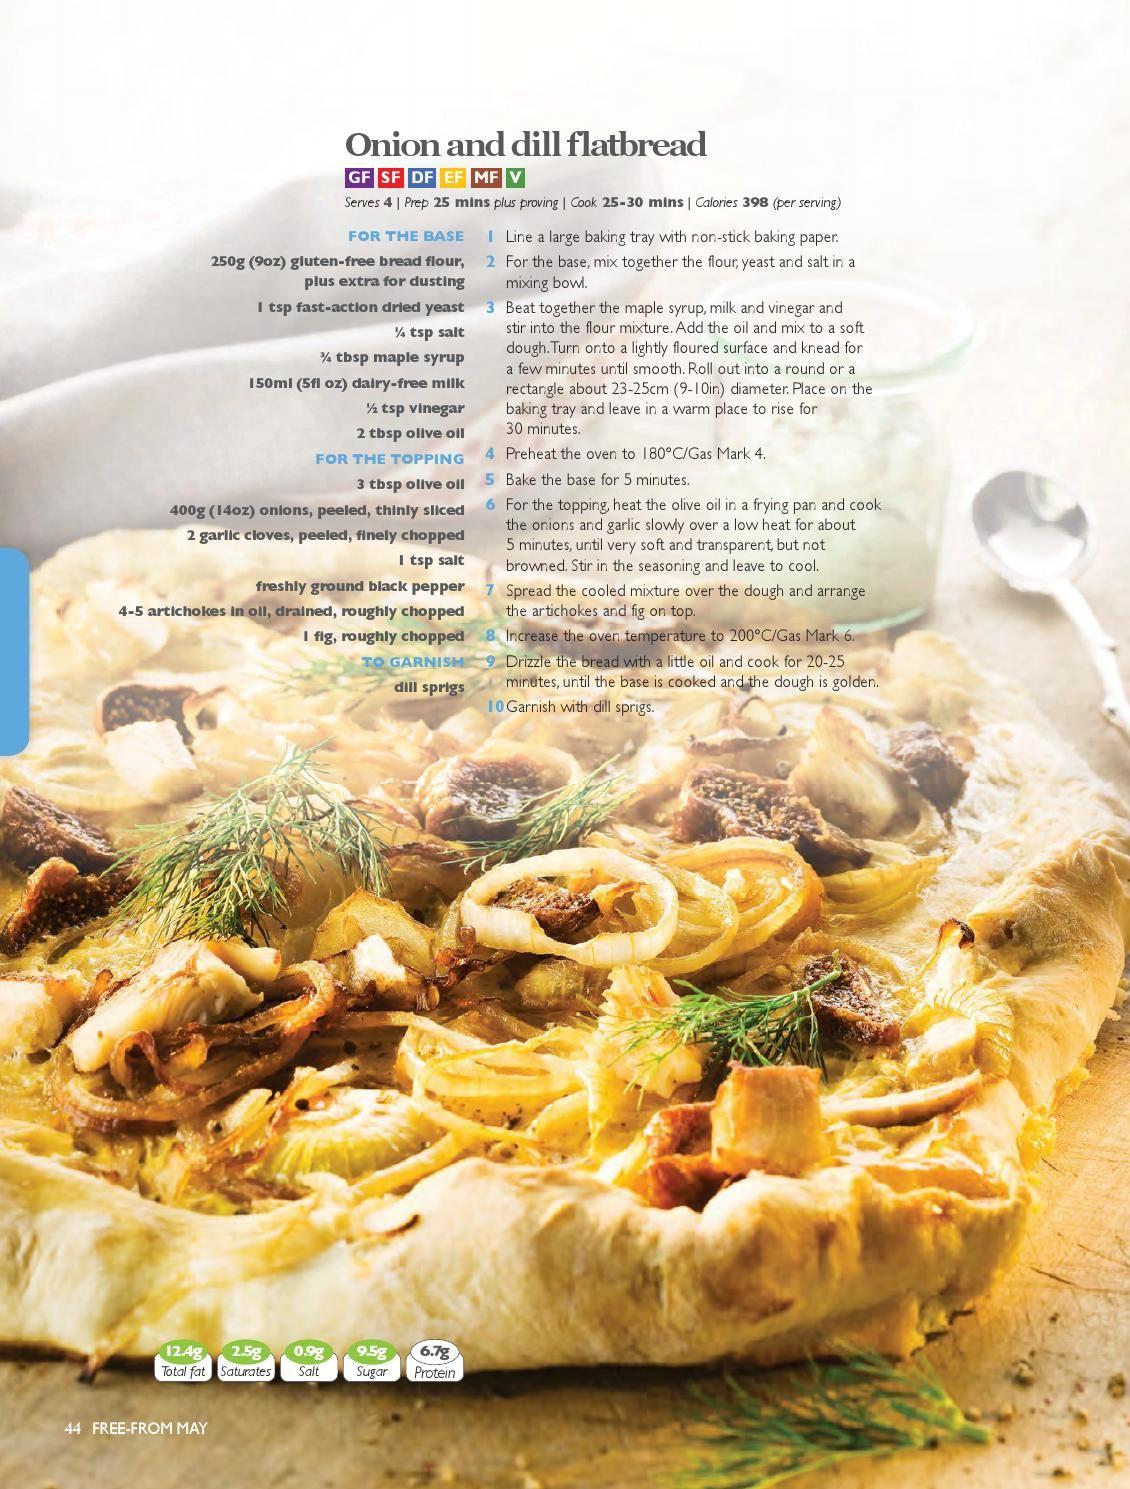 Issuu pdf downloader recipe cards pinterest recipe cards and issuu pdf downloader forumfinder Gallery